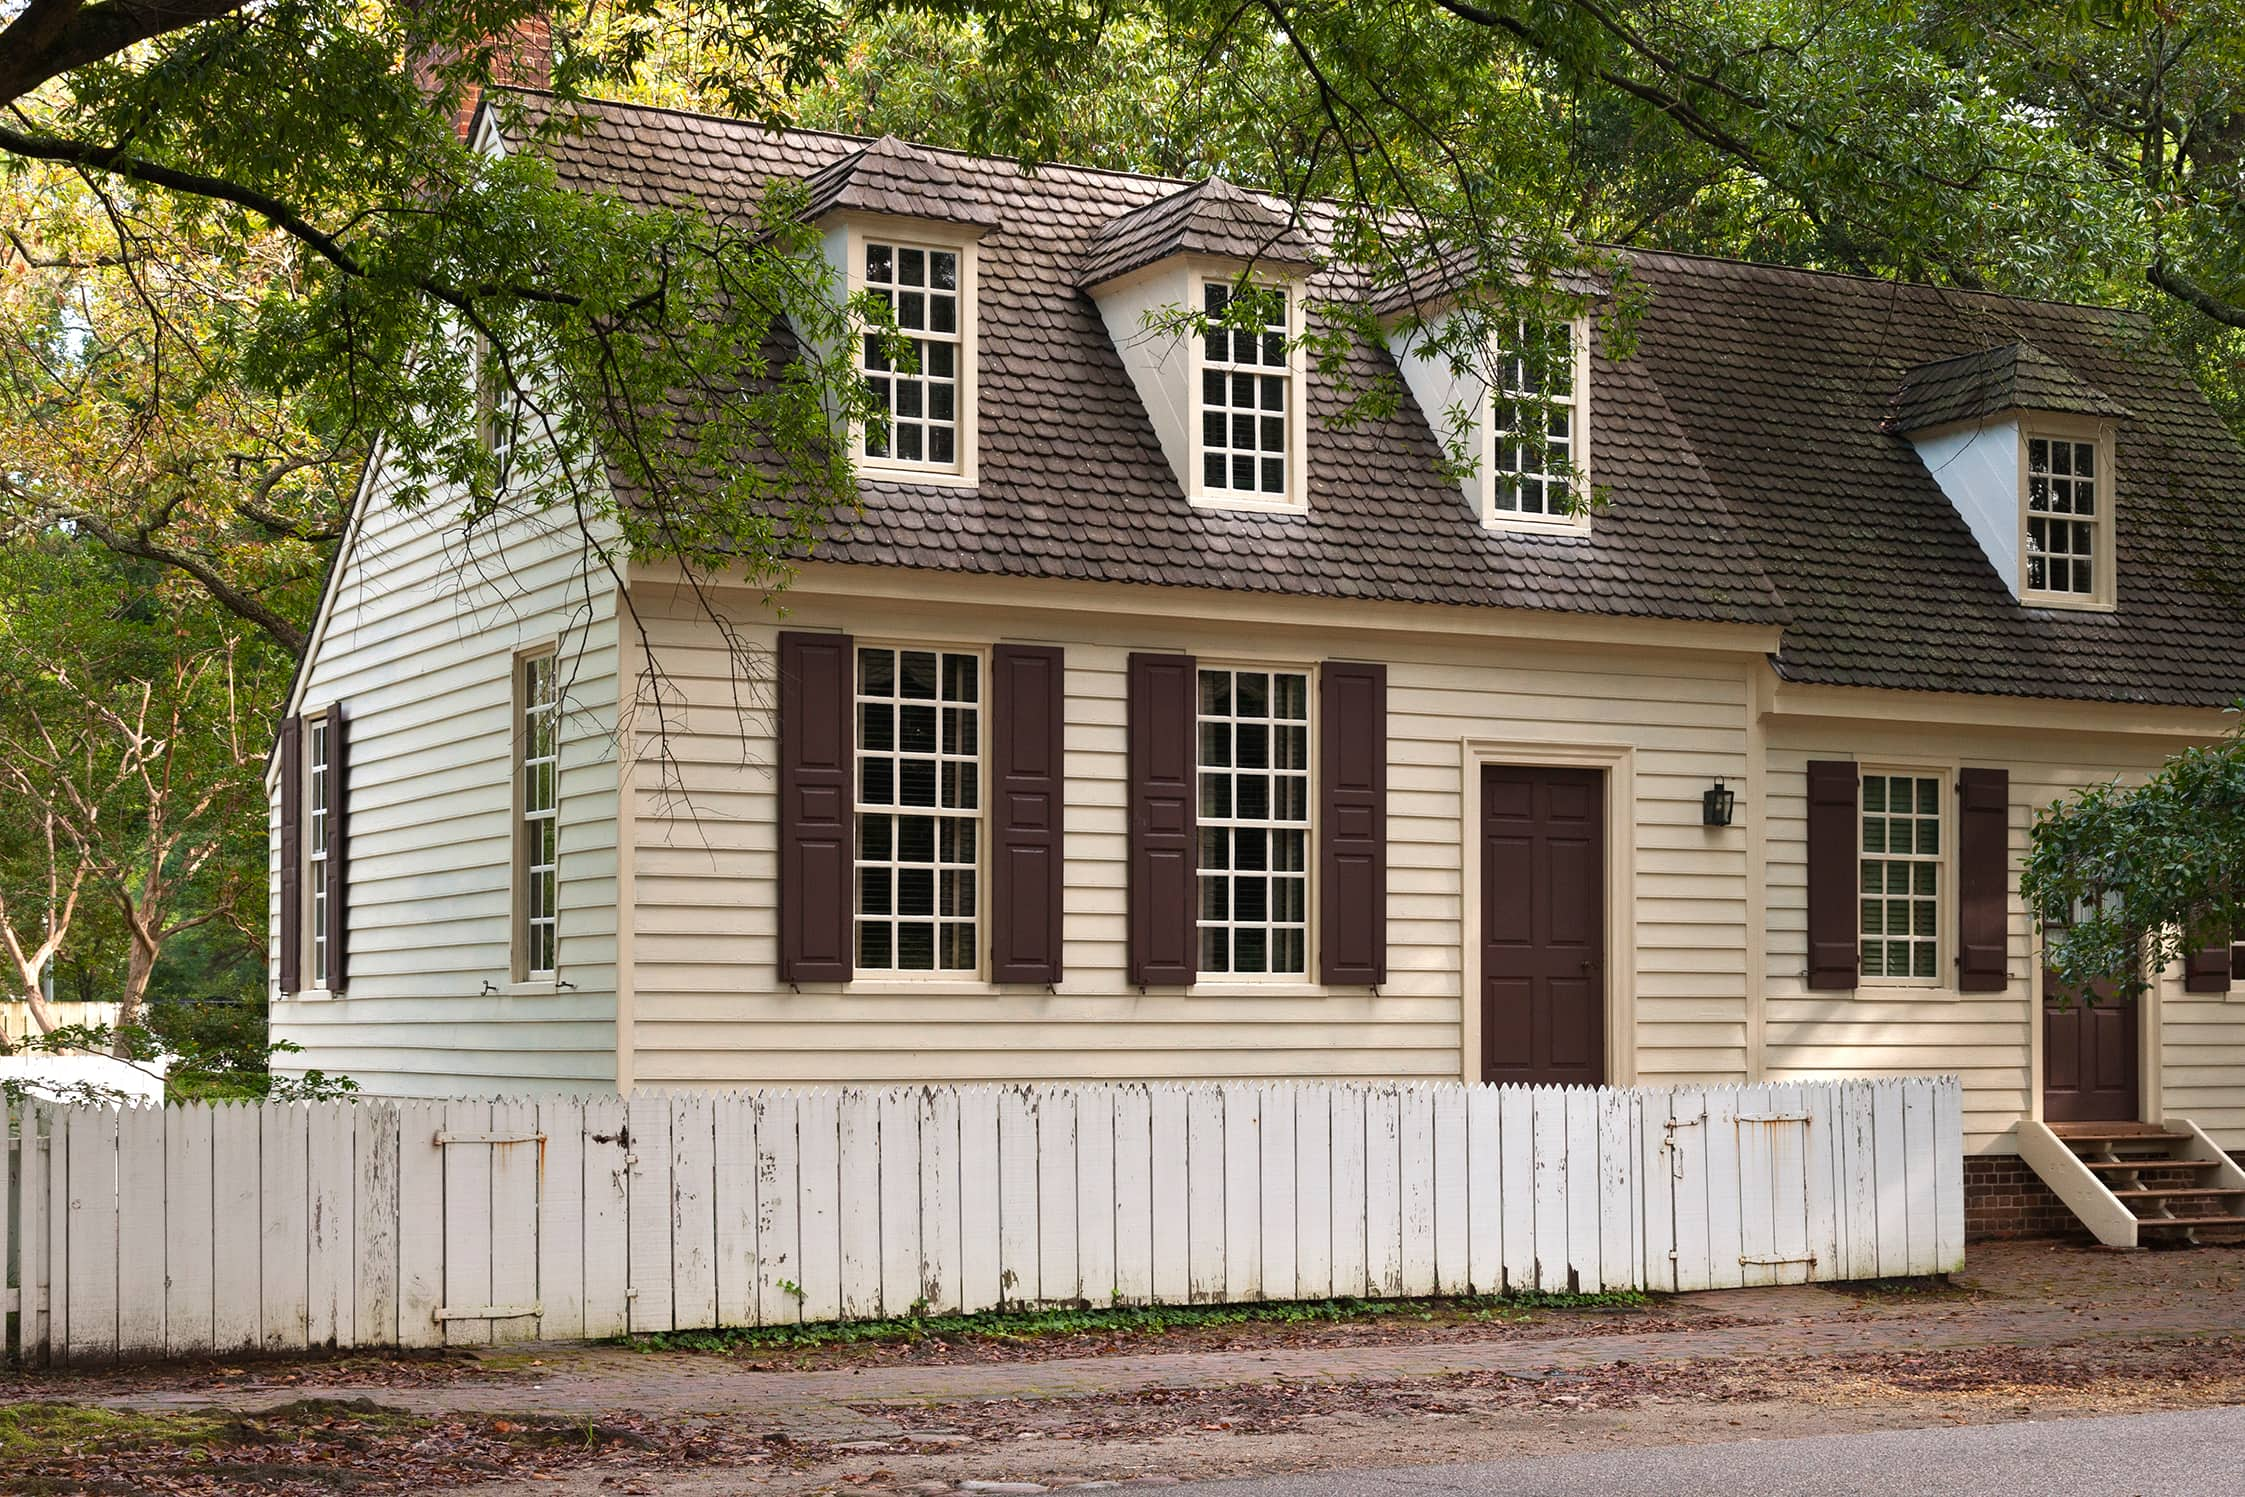 The George Jackson House